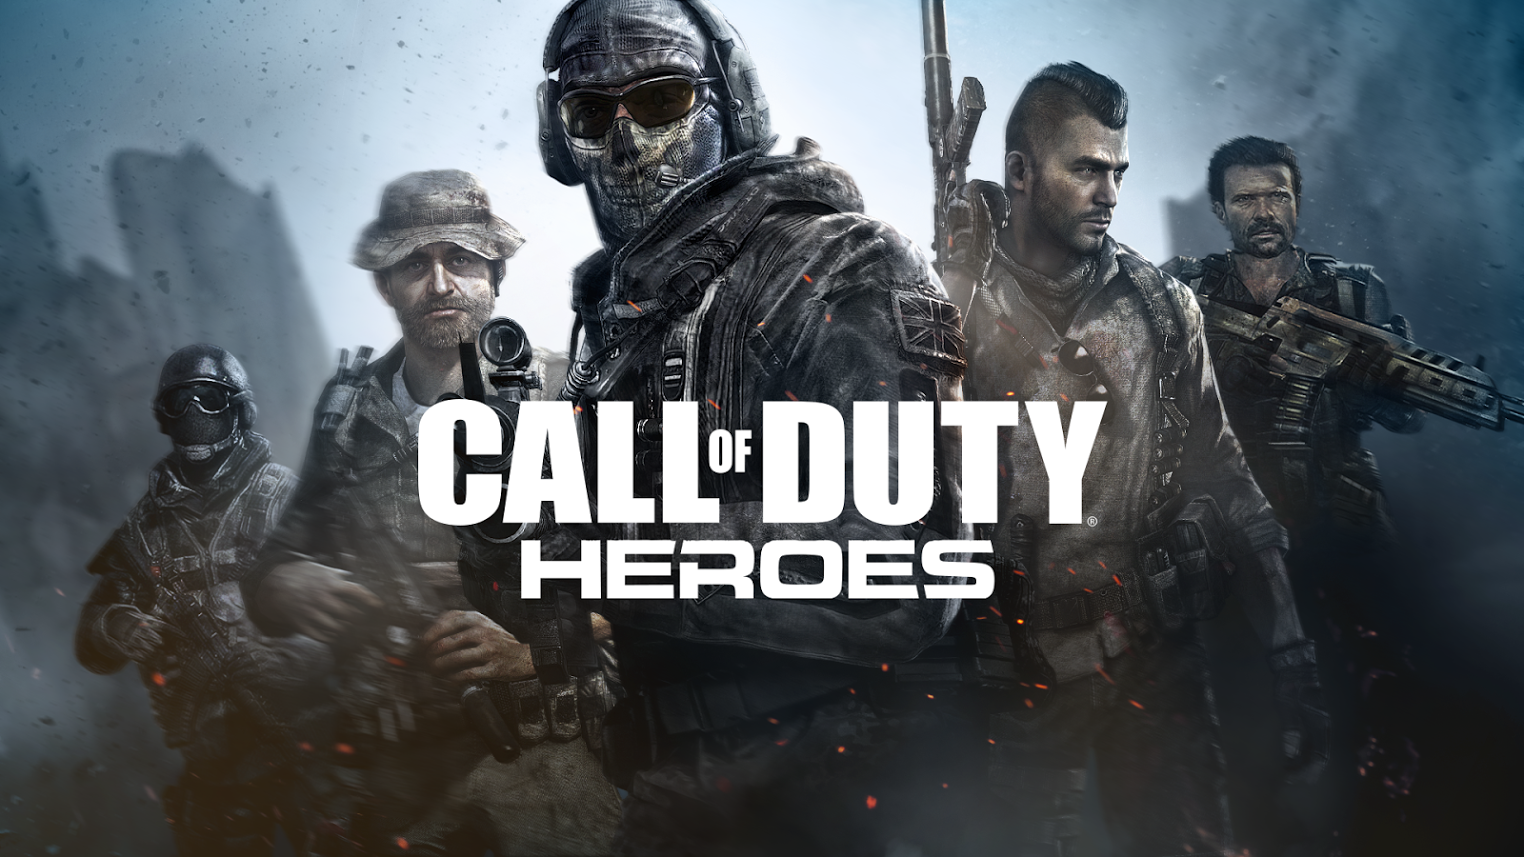 Descargar Call Of Duty Heroes V2 3 1 Android Apk Hack Mod Http Www Modxapk Net Descargar Call Of Duty Heroes And Call Of Duty Juegos Para Celular Android